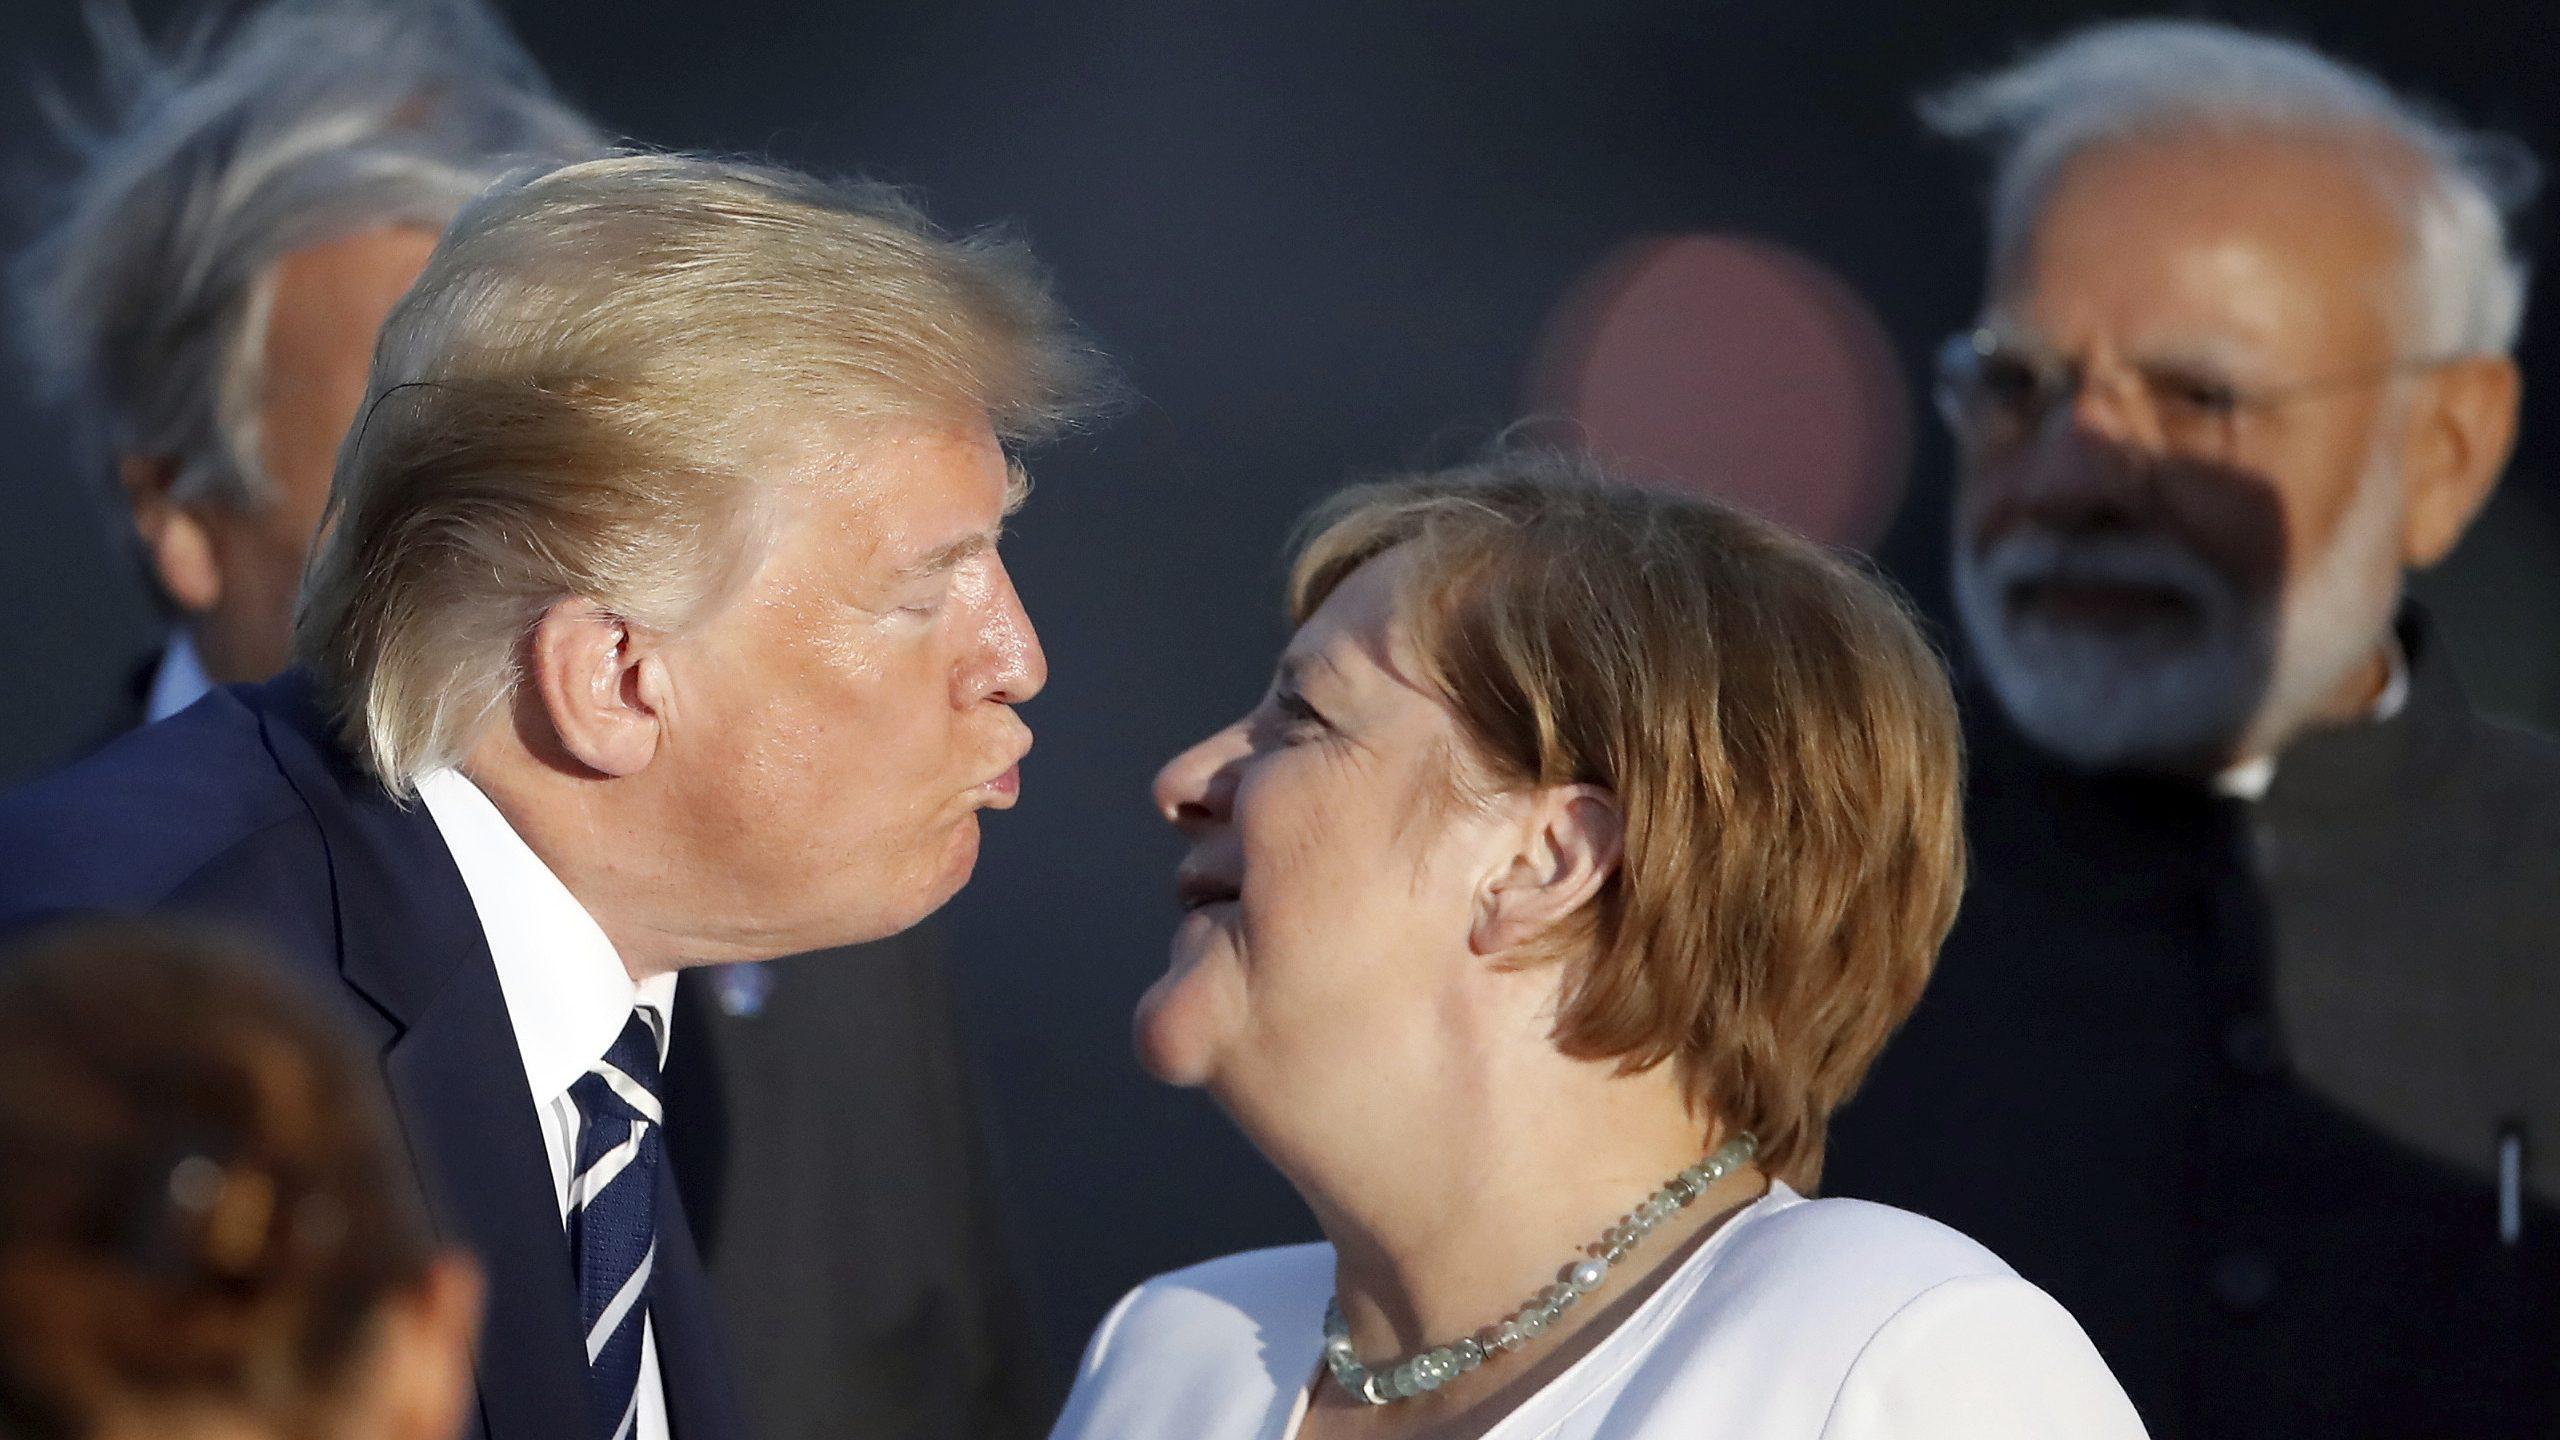 Trump kissing Angela Merkel